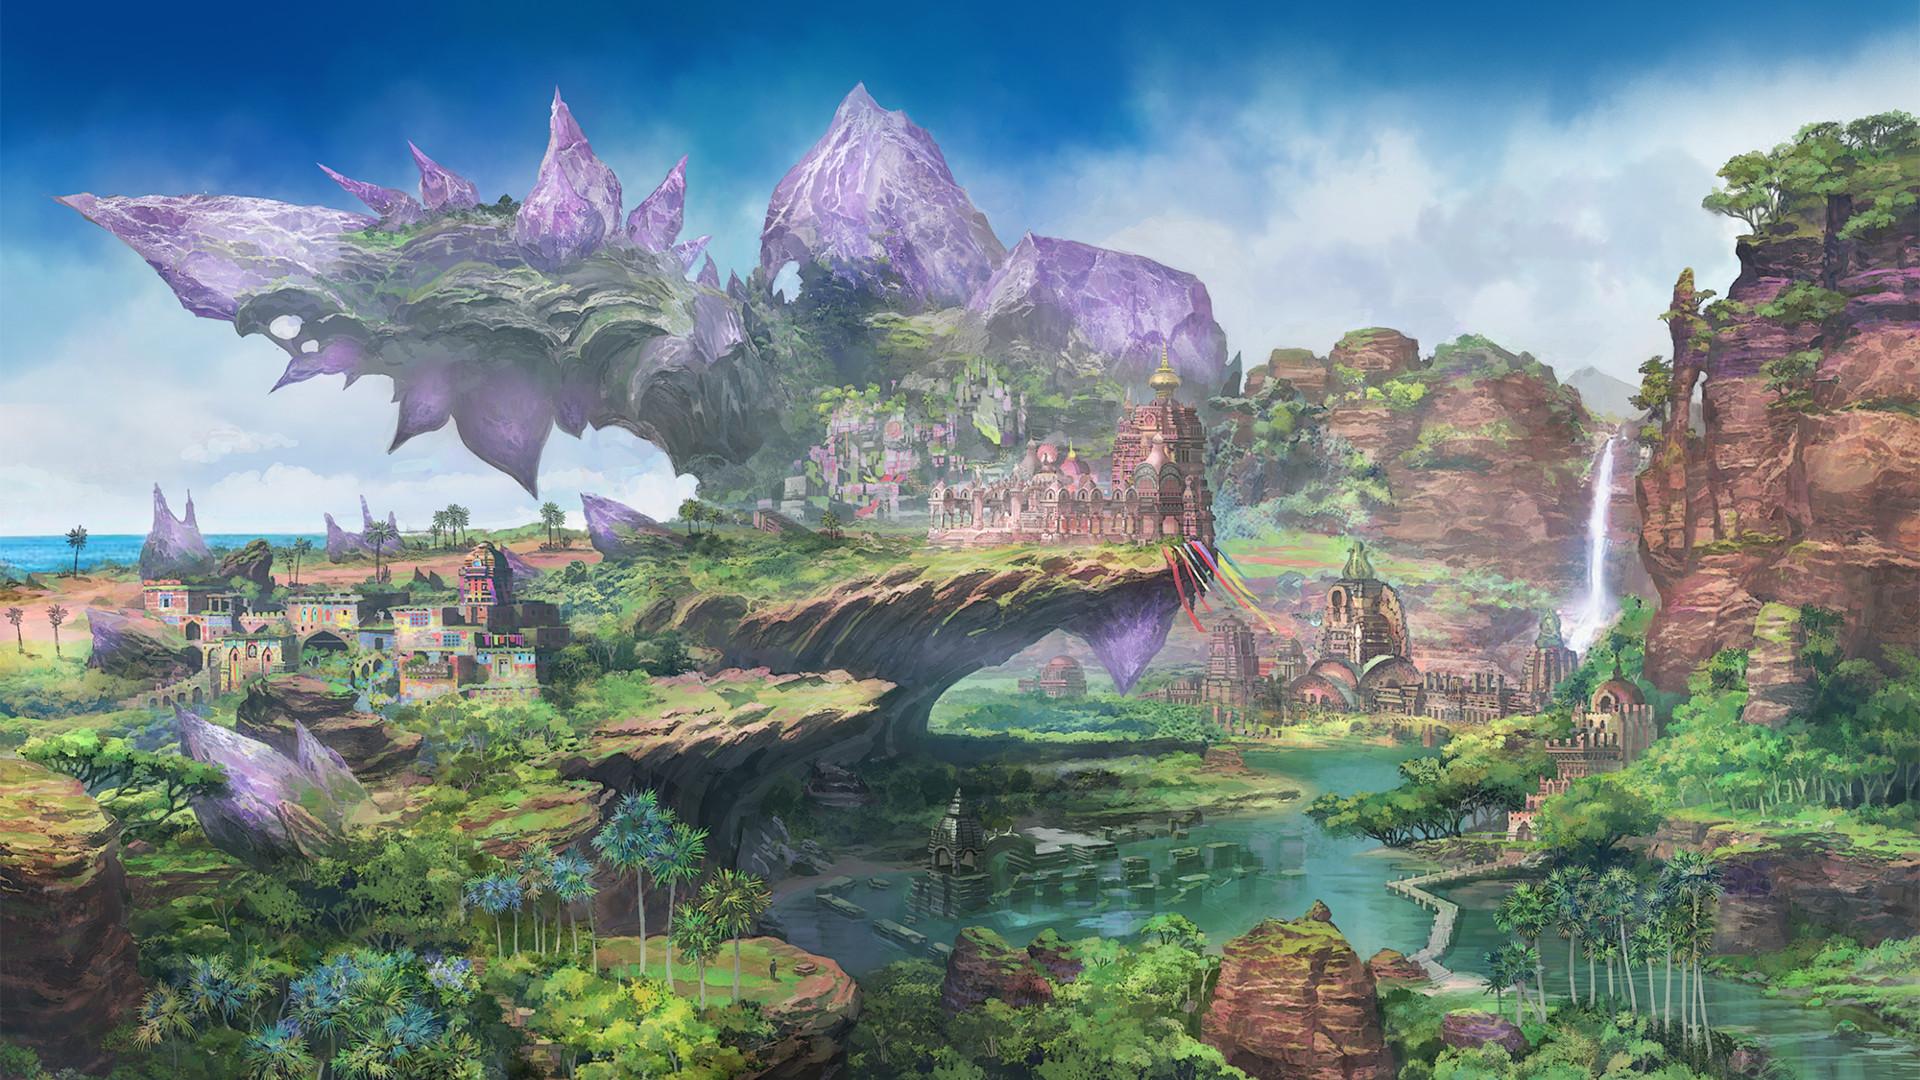 Final Fantasy 14's new expansion is Endwalker, coming autumn 2021